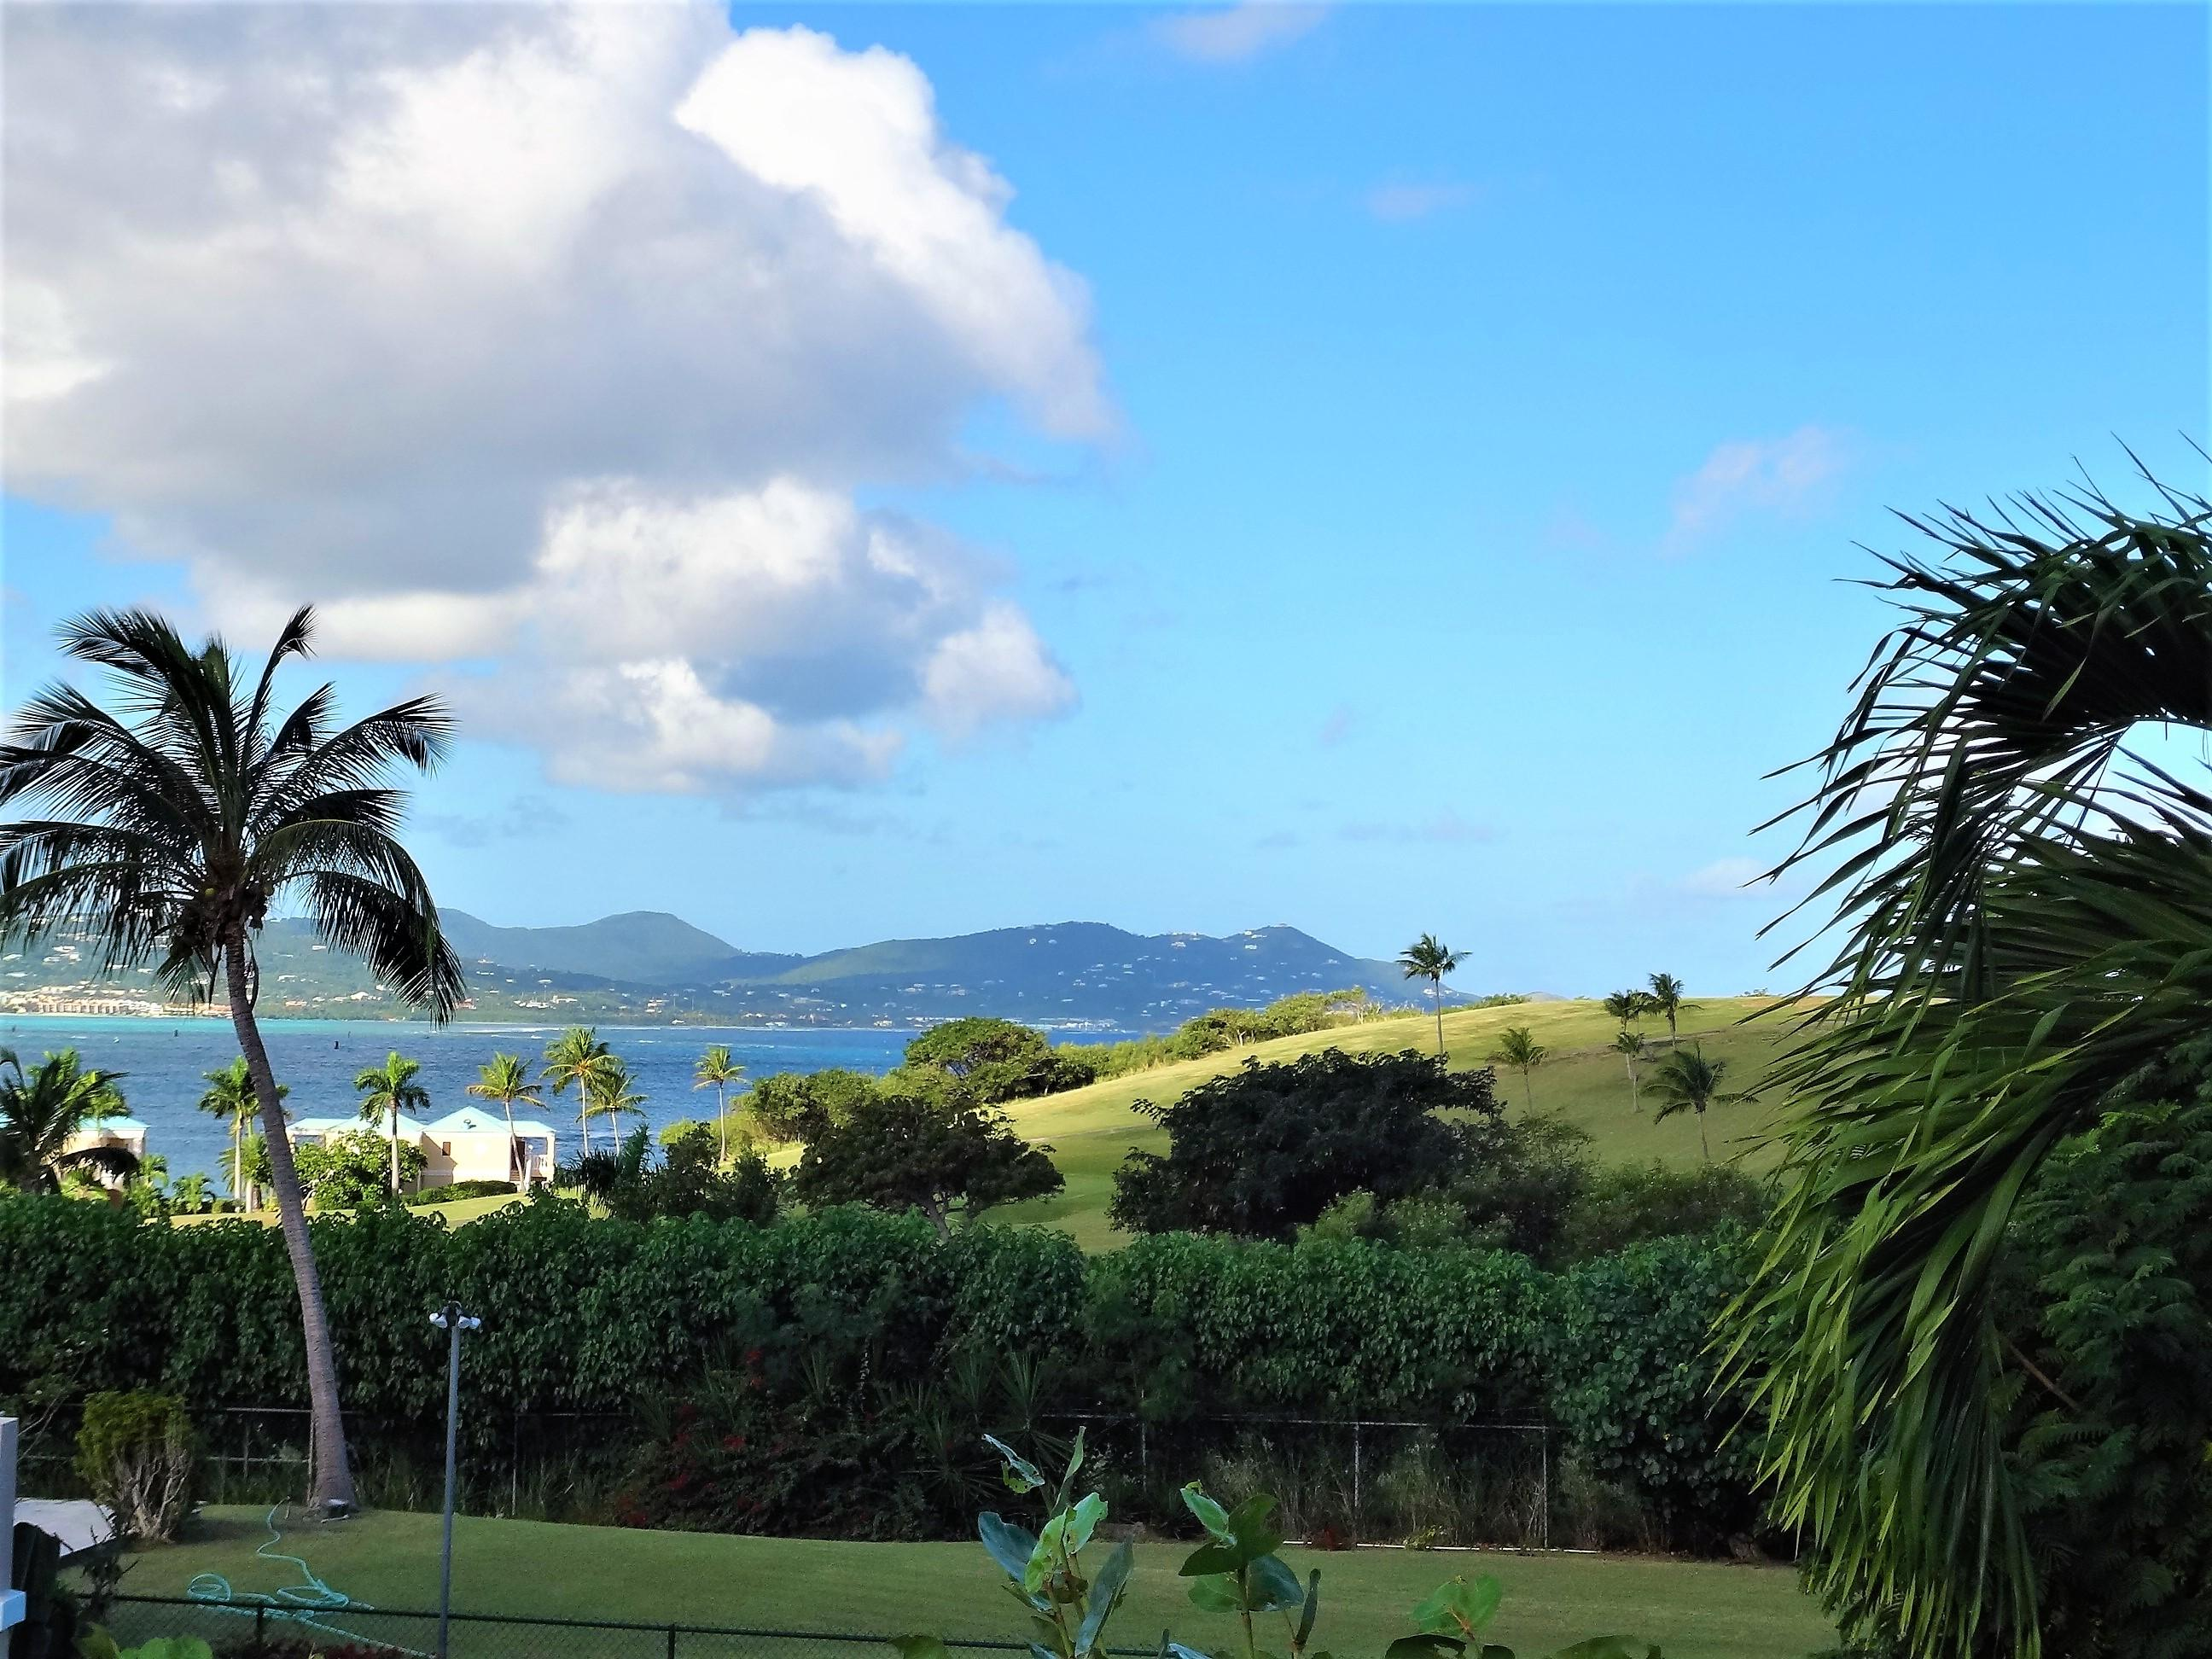 Land for Sale at 39 Shoys (The) EA 39 Shoys (The) EA St Croix, Virgin Islands 00820 United States Virgin Islands